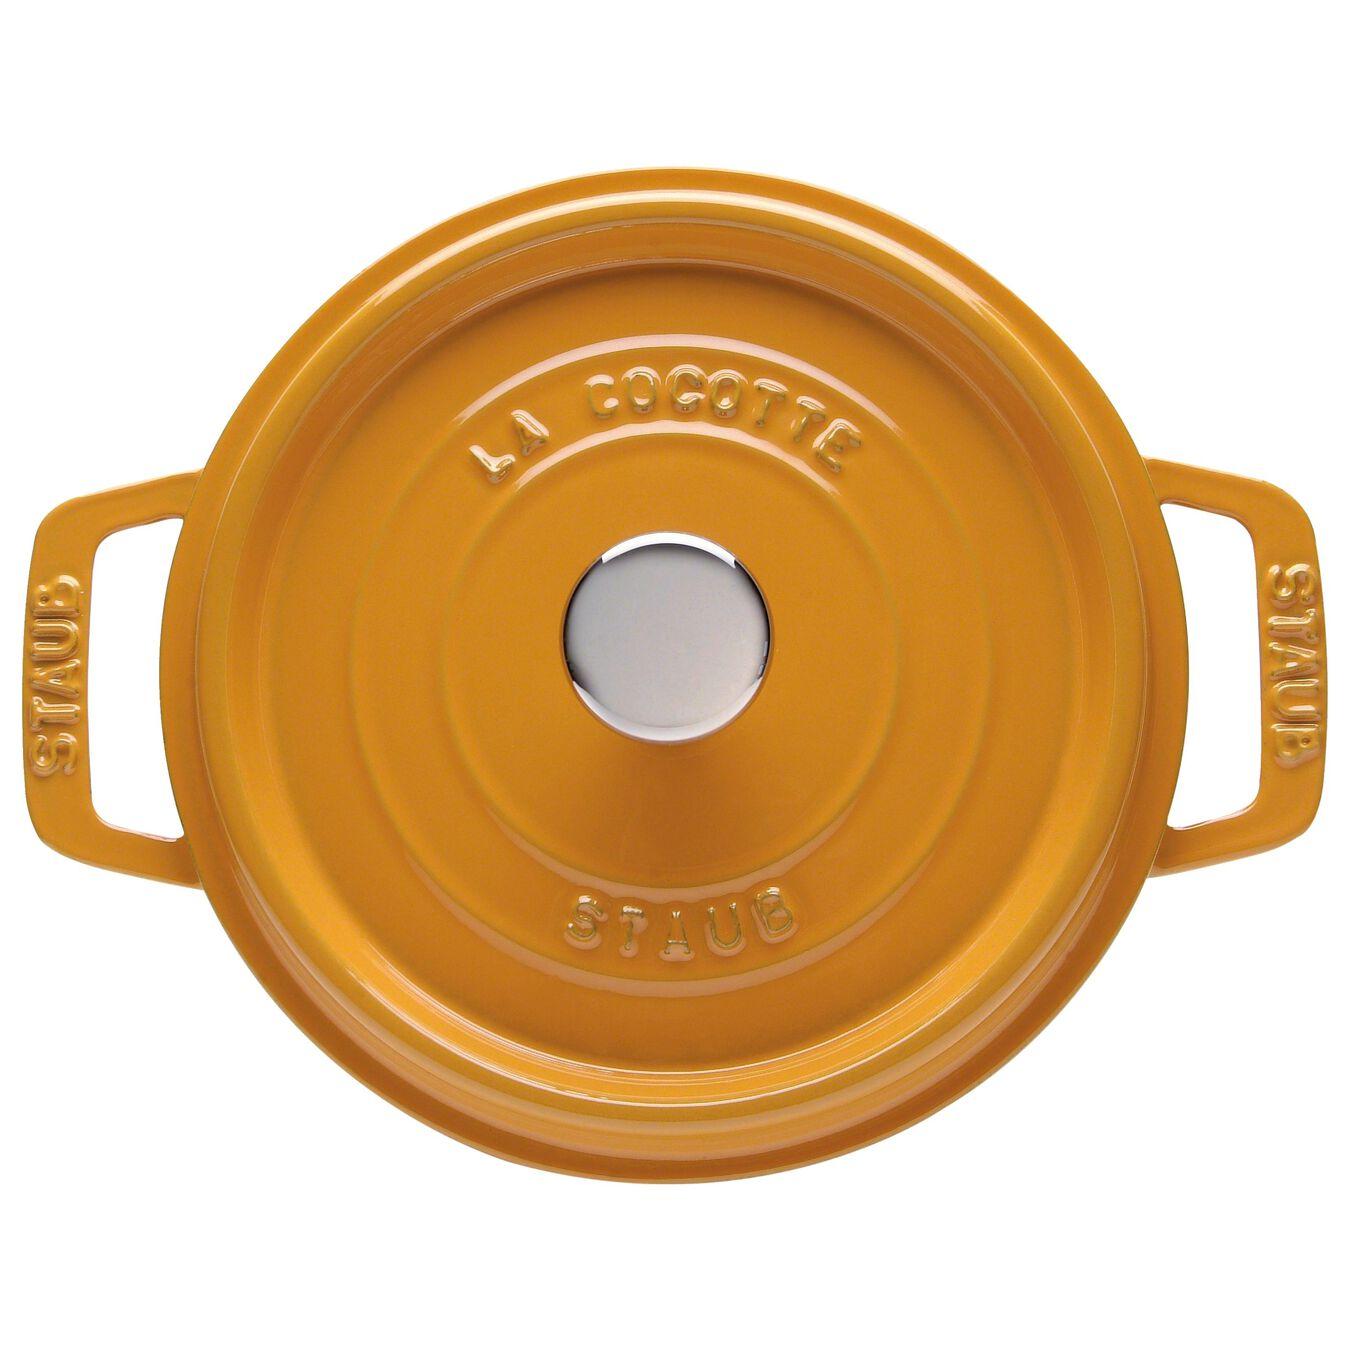 Cocotte 24 cm, rund, Senf, Gusseisen,,large 1